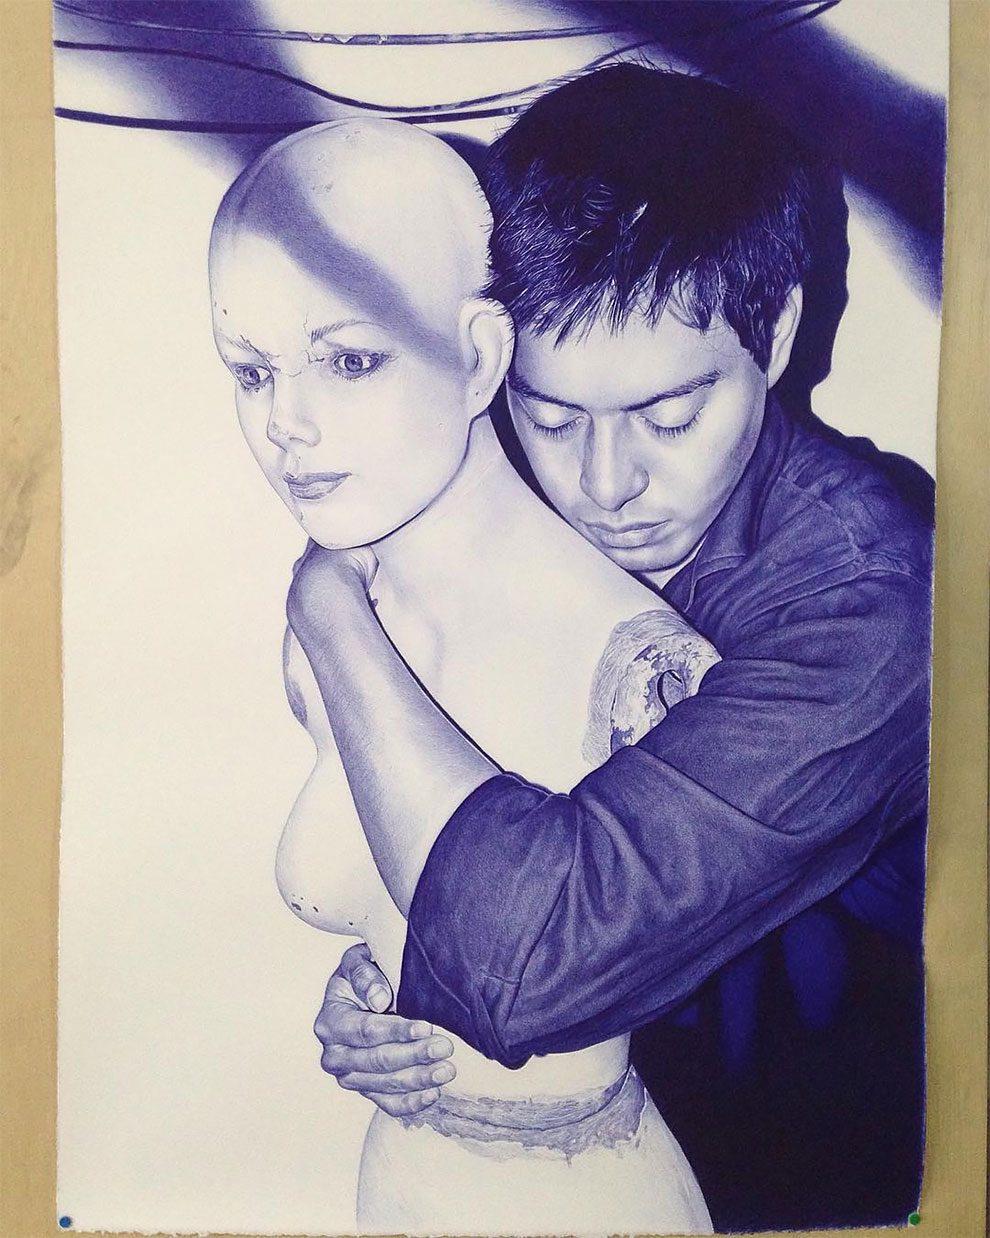 disegni-penna-biro-iperrealismo-alfredo-chamal-18